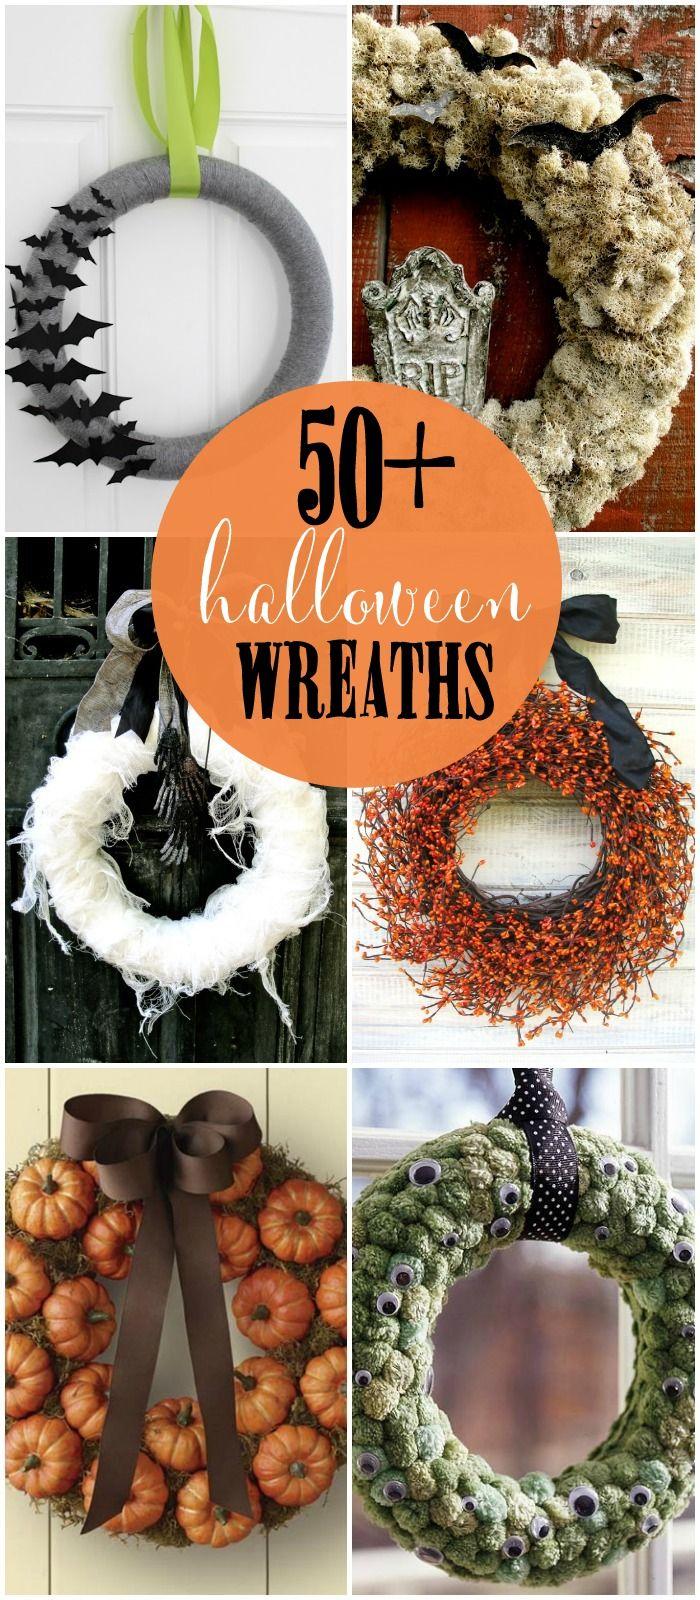 50+ Halloween Wreaths to Make this Holiday Season | Lil' Luna